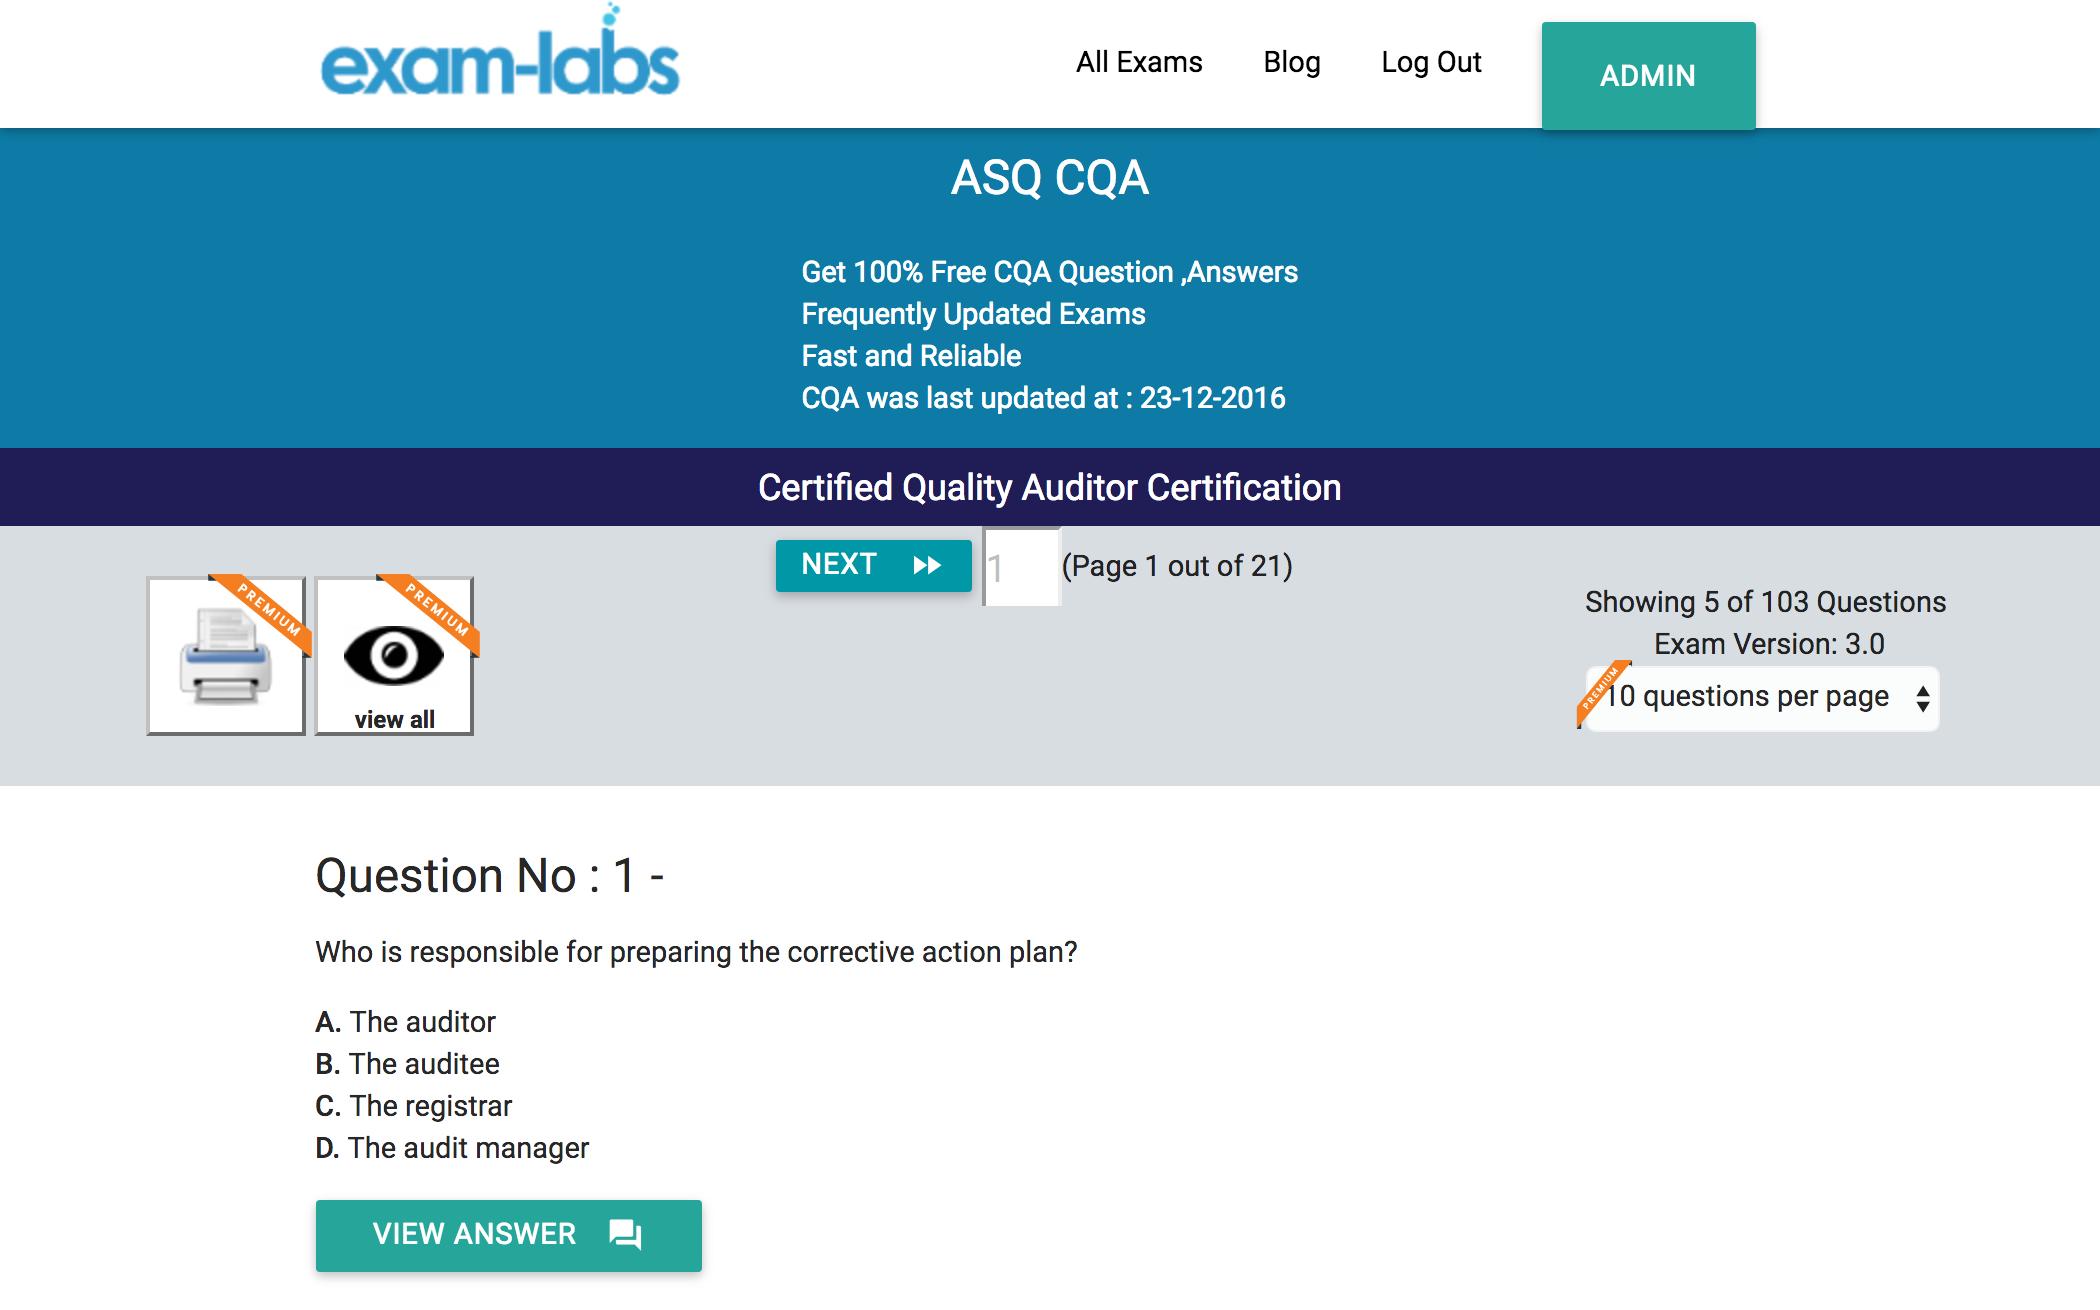 CQA - ASQ Practice Exam Questions - 100% Free | Exam-Labs